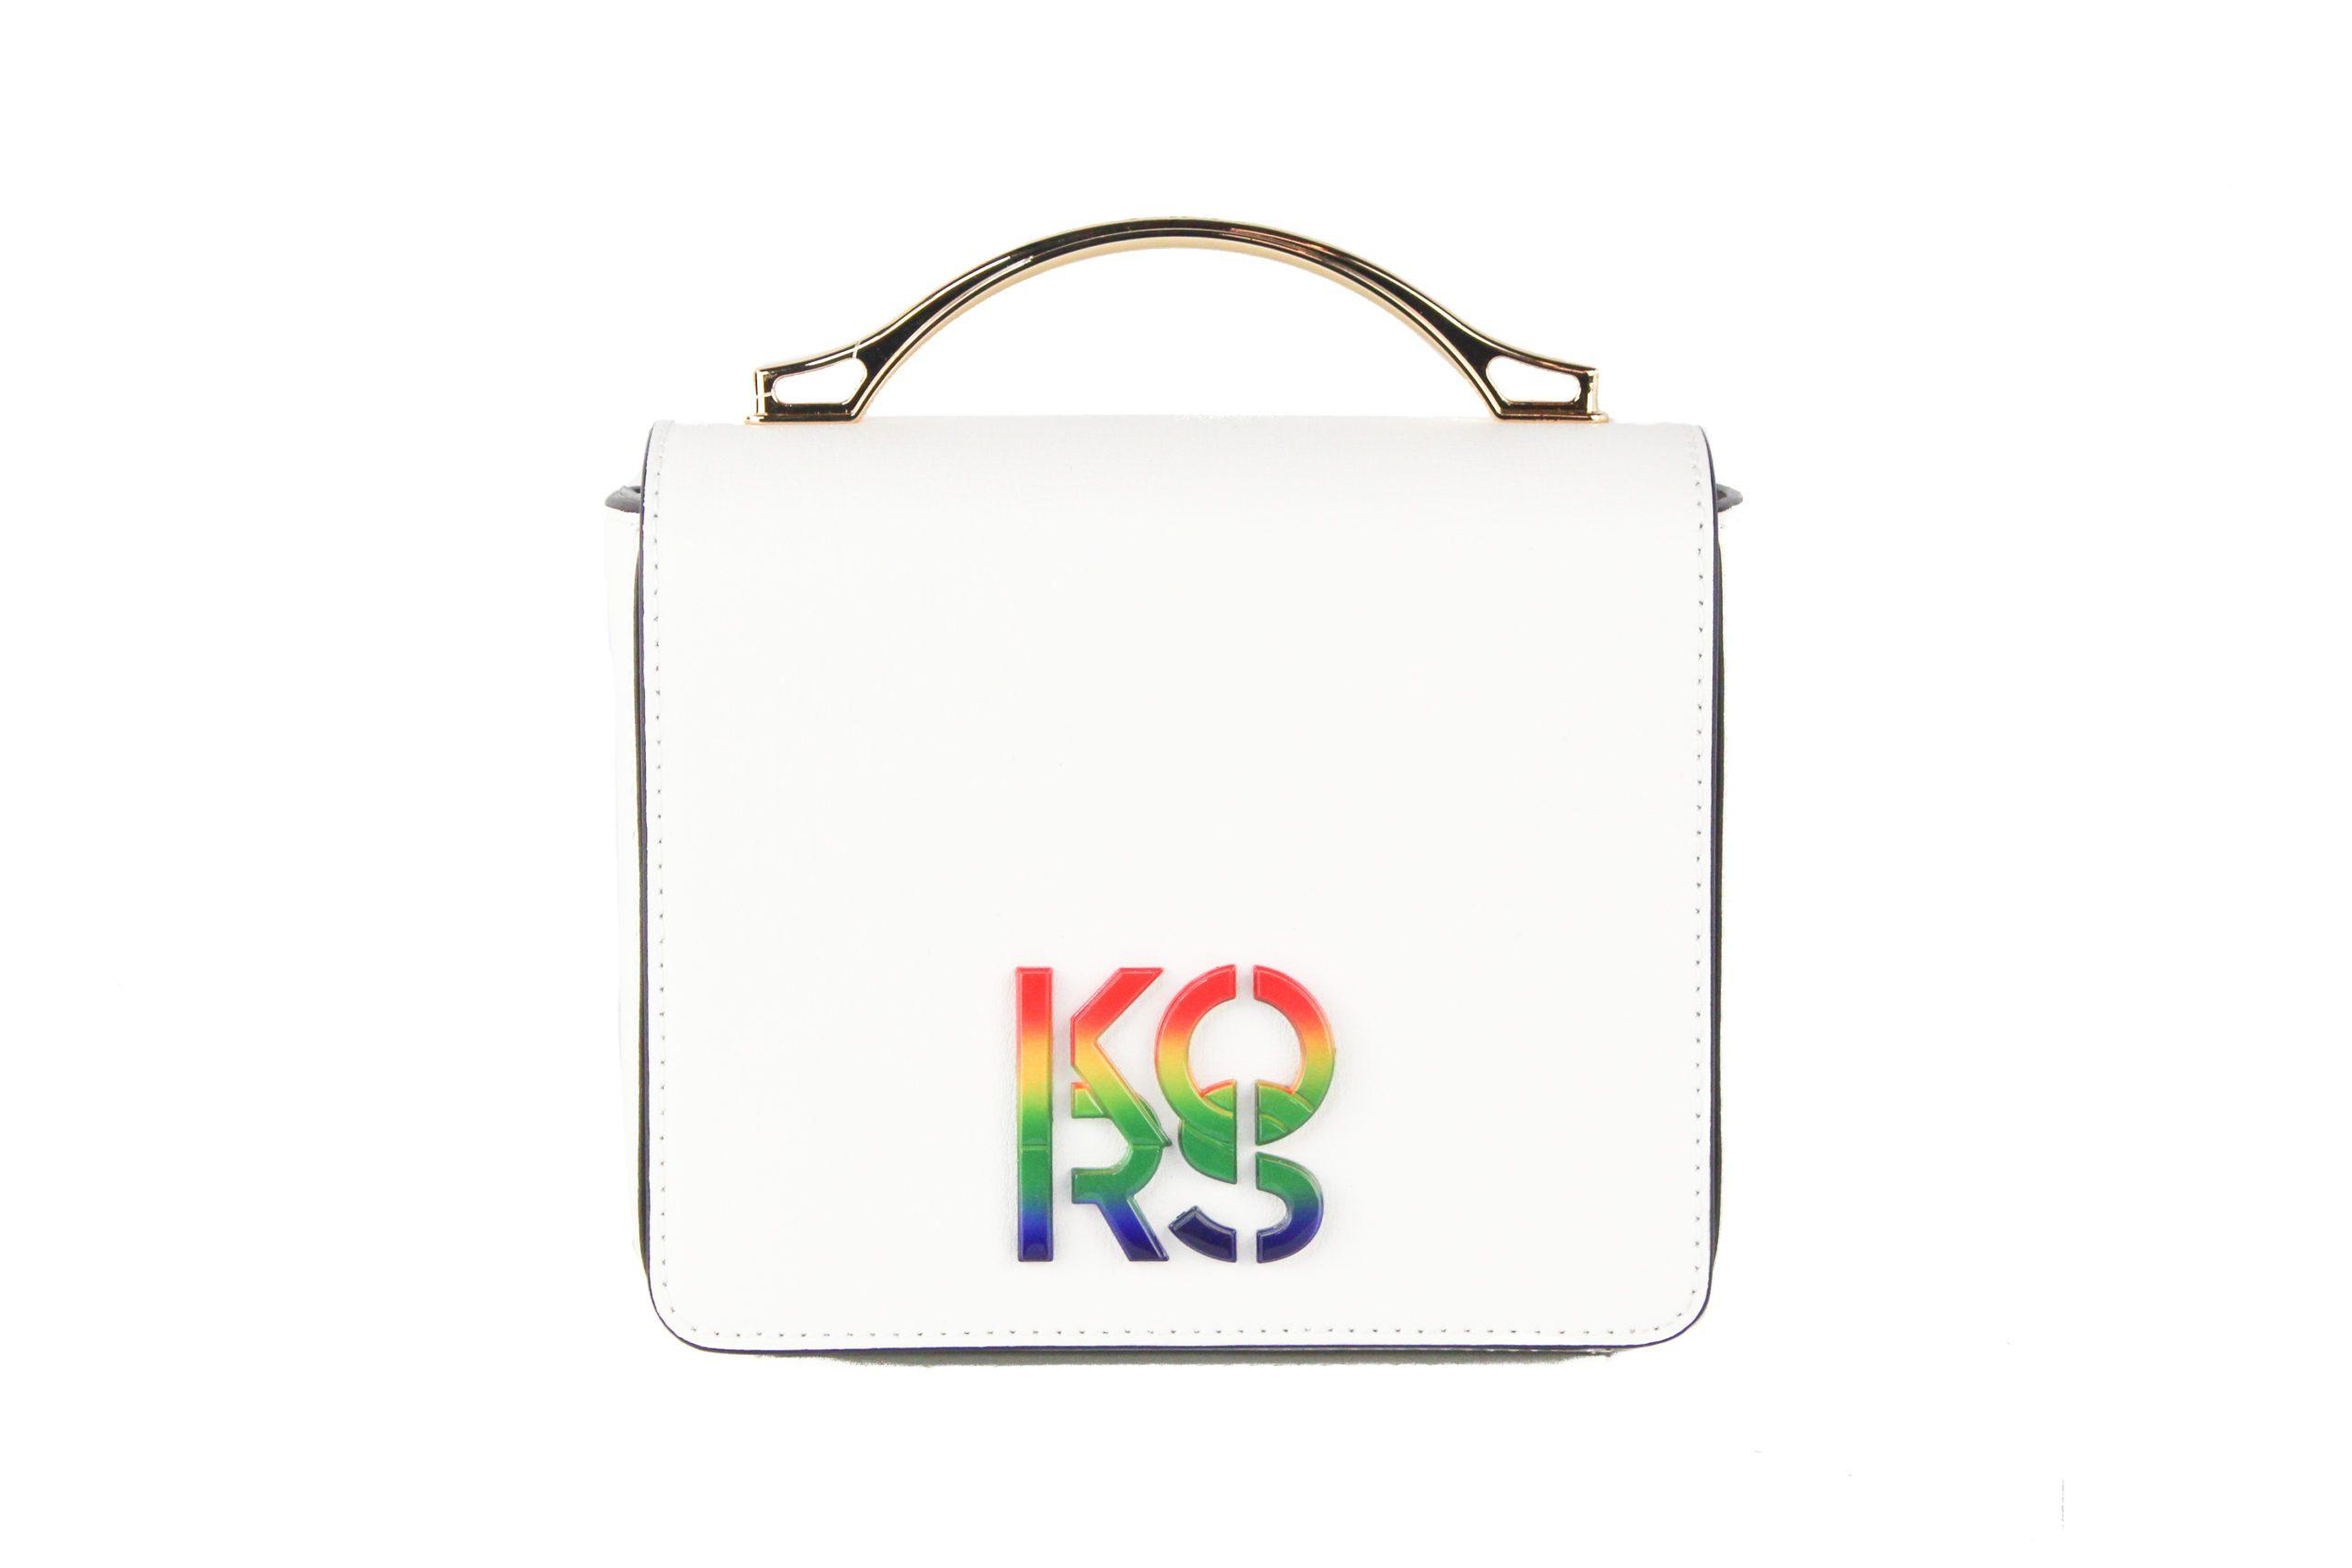 Michael Kors Women's Pride Shoulder Bag White 507292